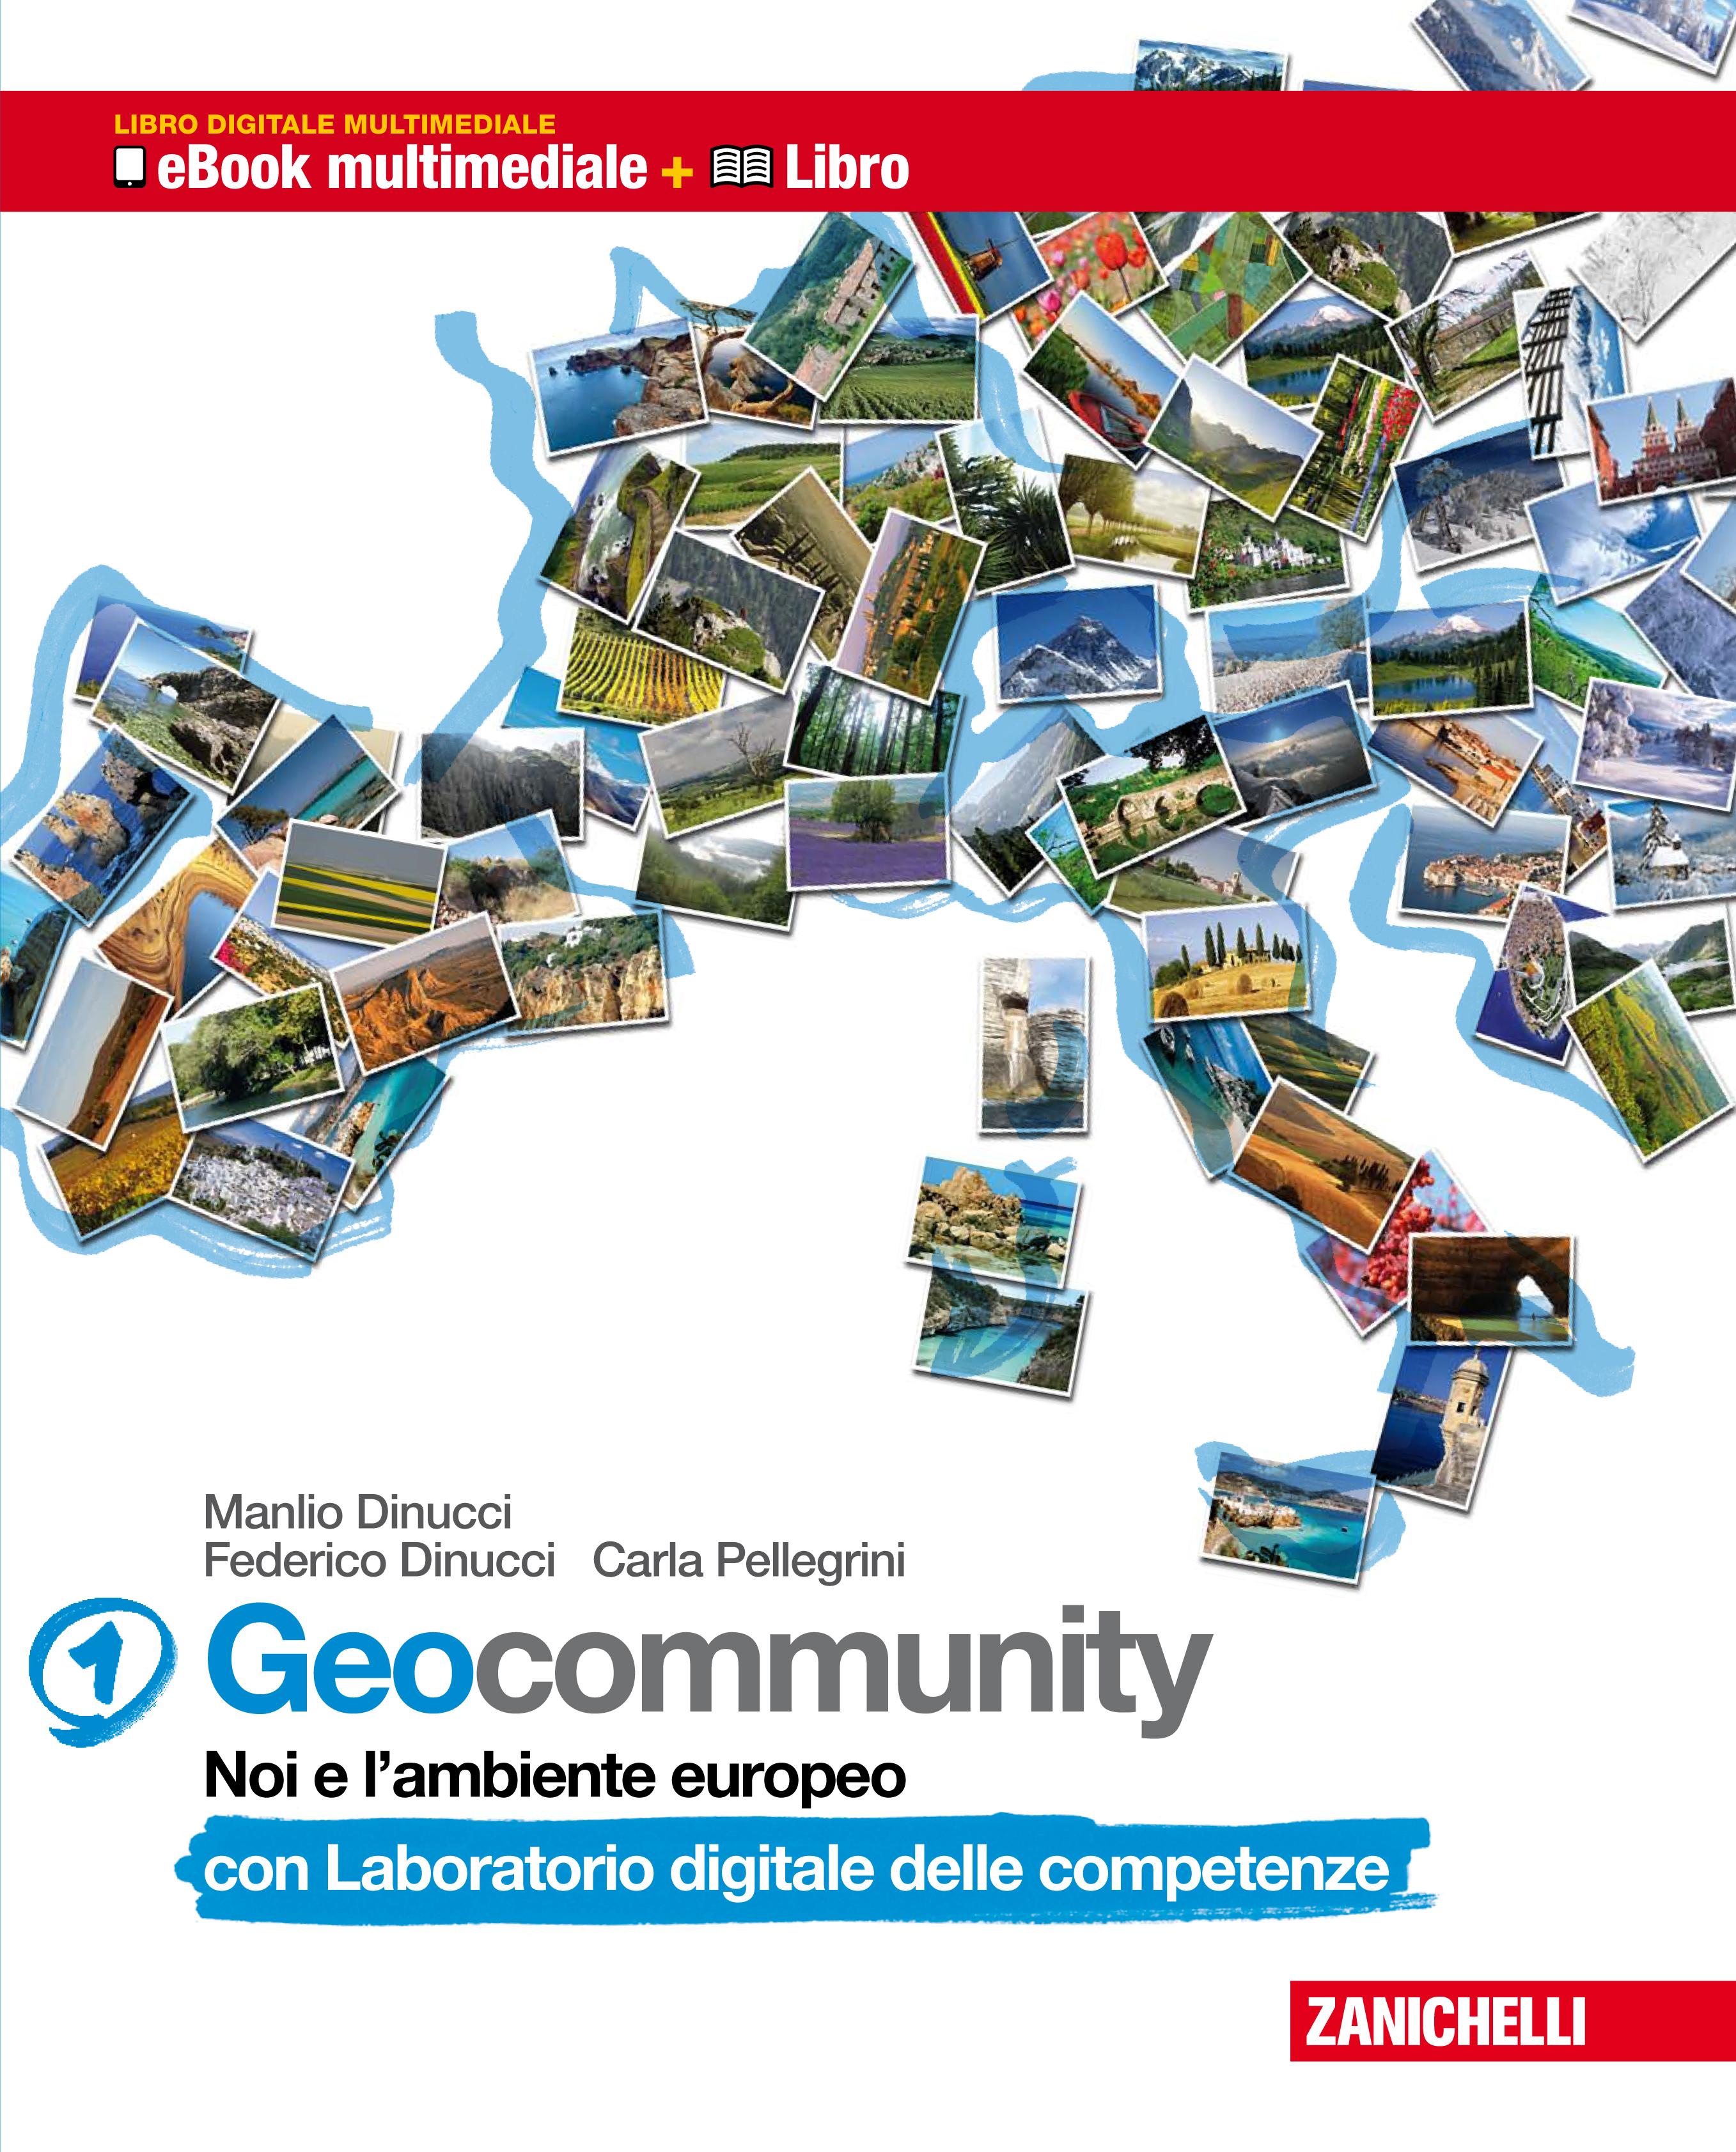 Geocommunity